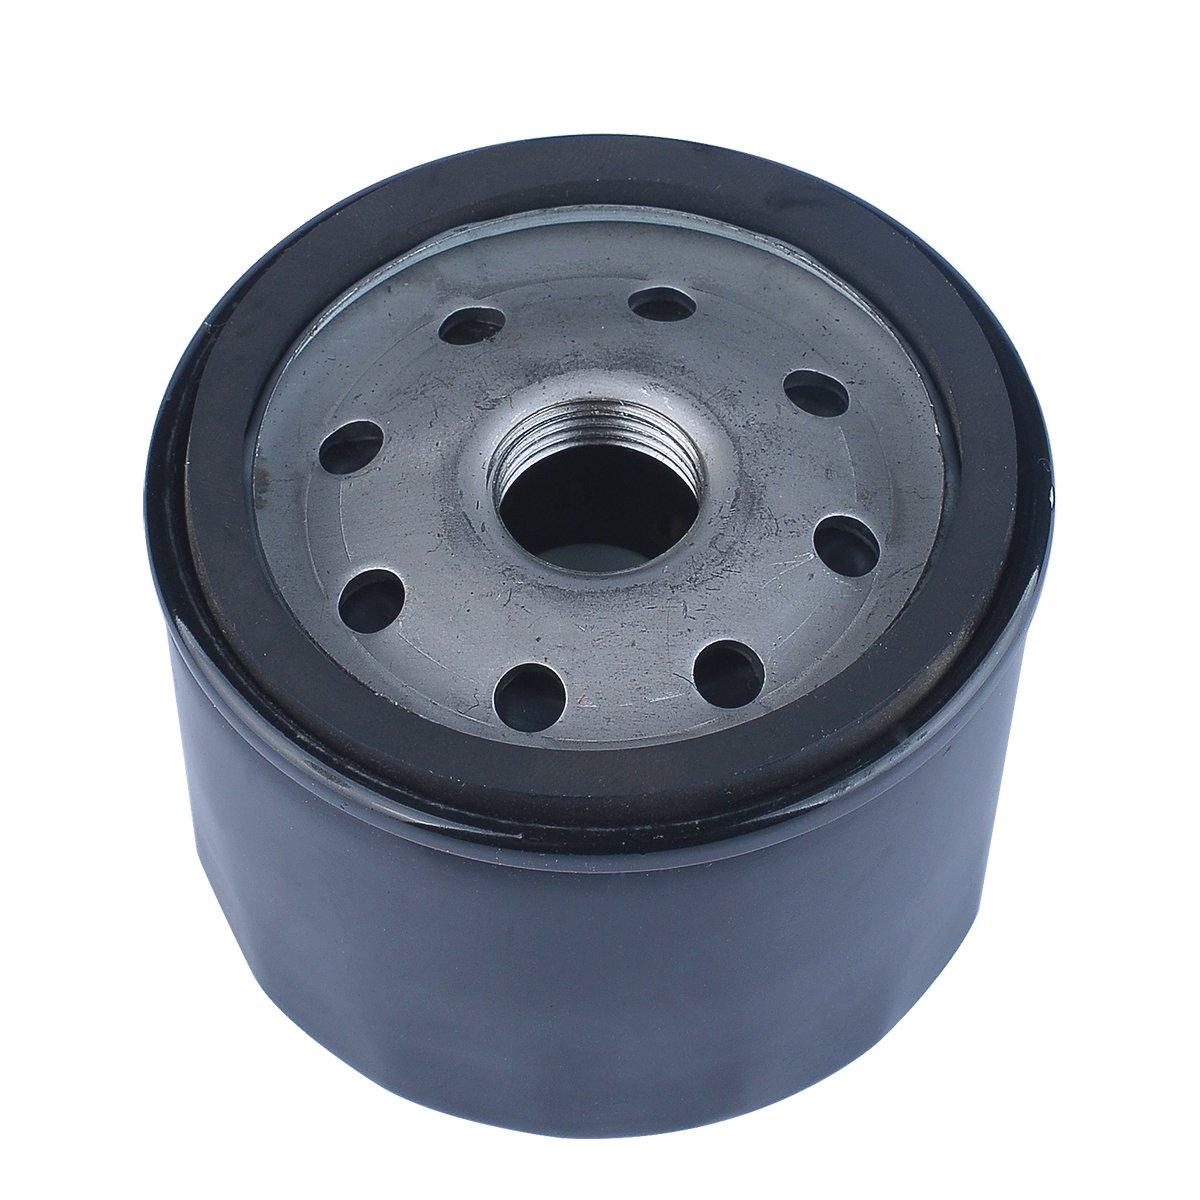 HIPA Replacement Oil Filter for John Deere AM125424 Tecumseh 36563 Engine Lawn Mower